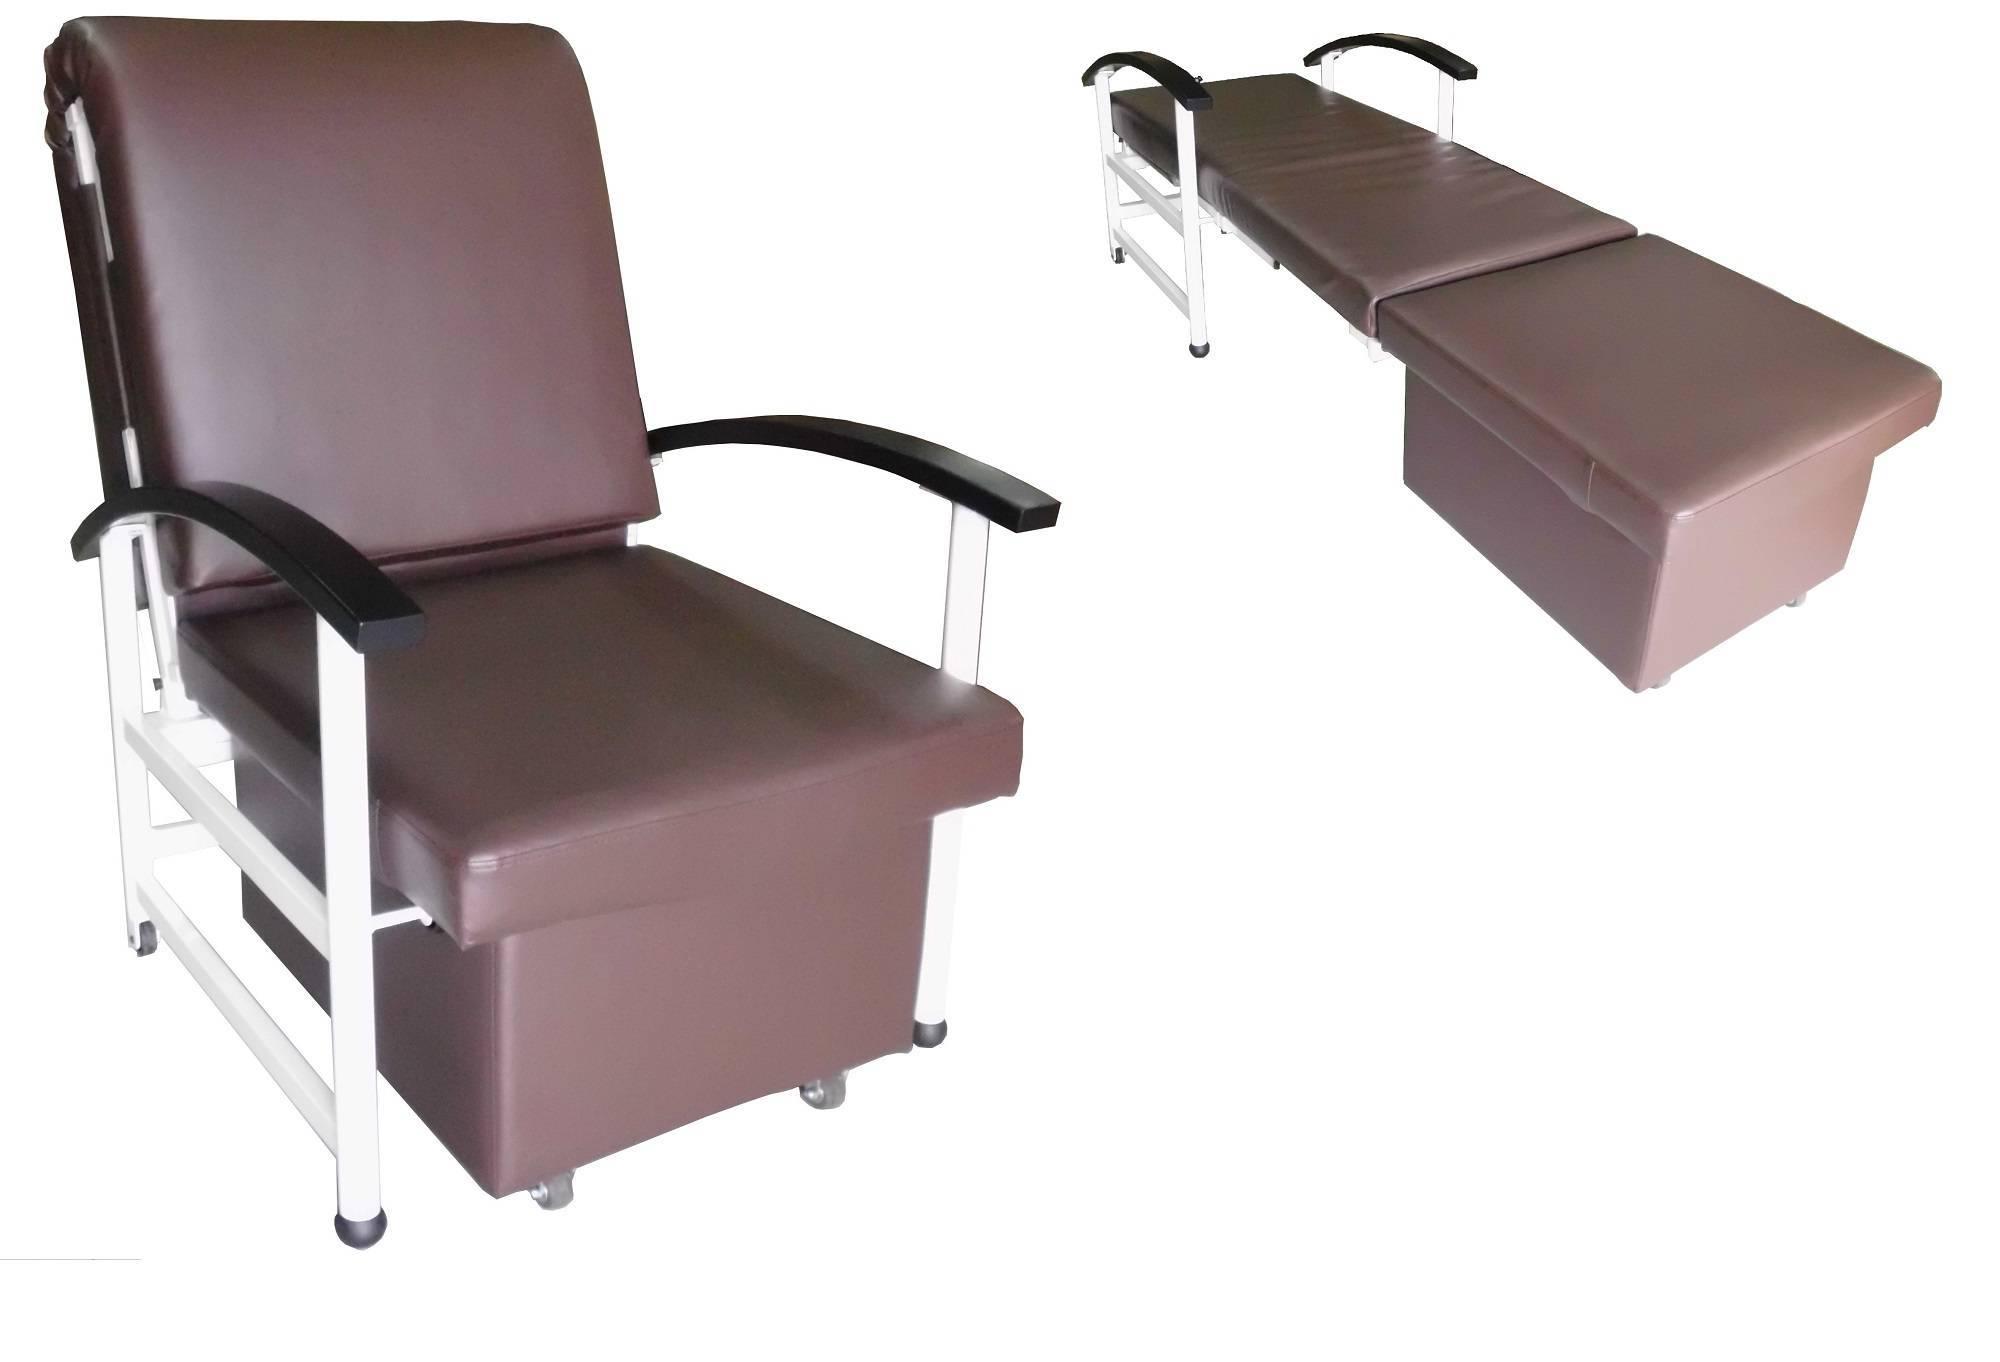 BH-9164 Accompany Recliner Bed Sofa, Recliner Sofa, Hospital Furniture